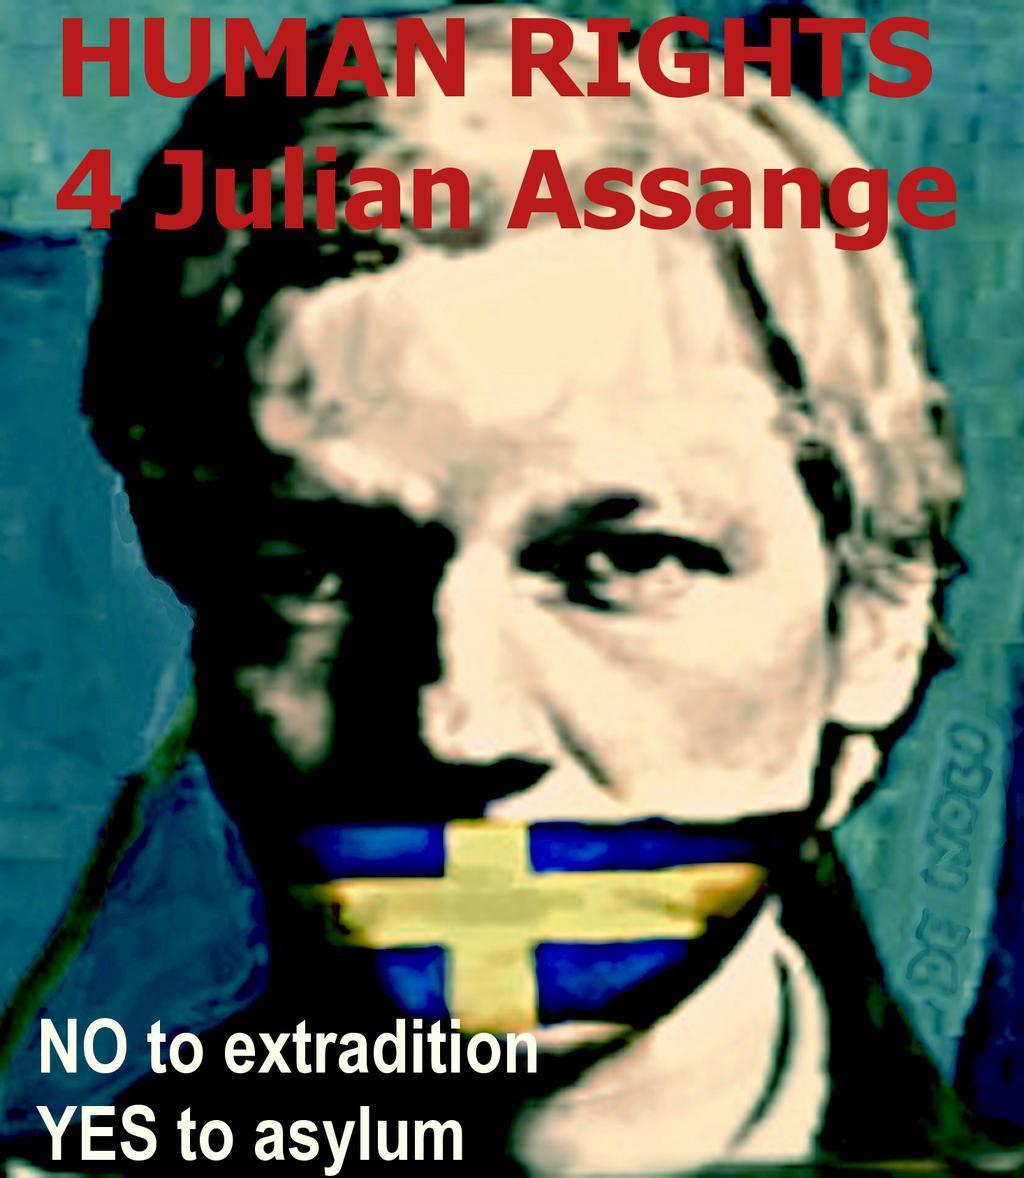 assange-extradition-no-by-arte-de-noli